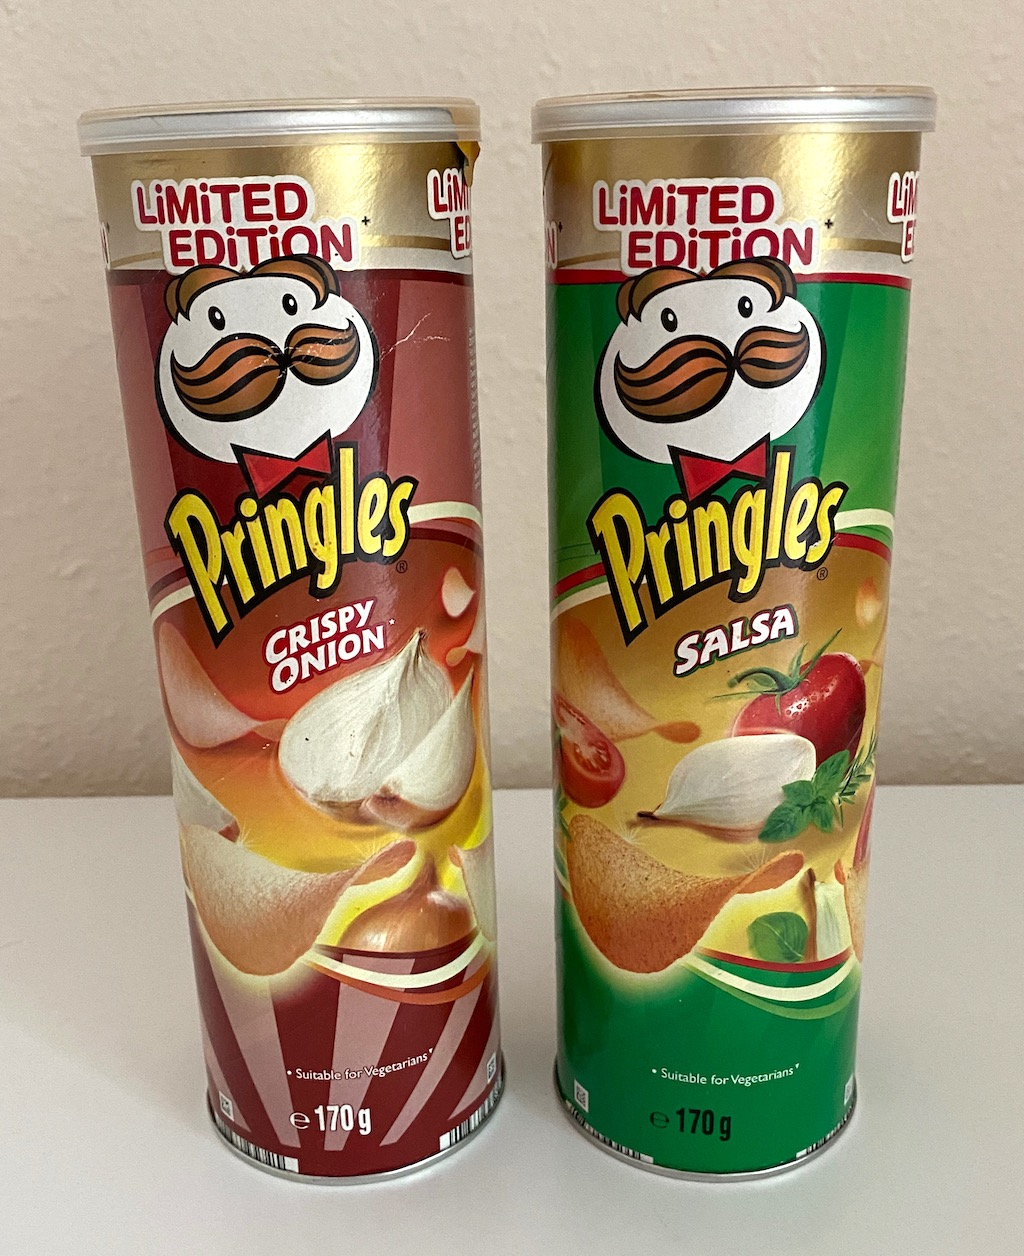 Pringles Limited Edition 2009 Crispy Onion-Salsa 170G